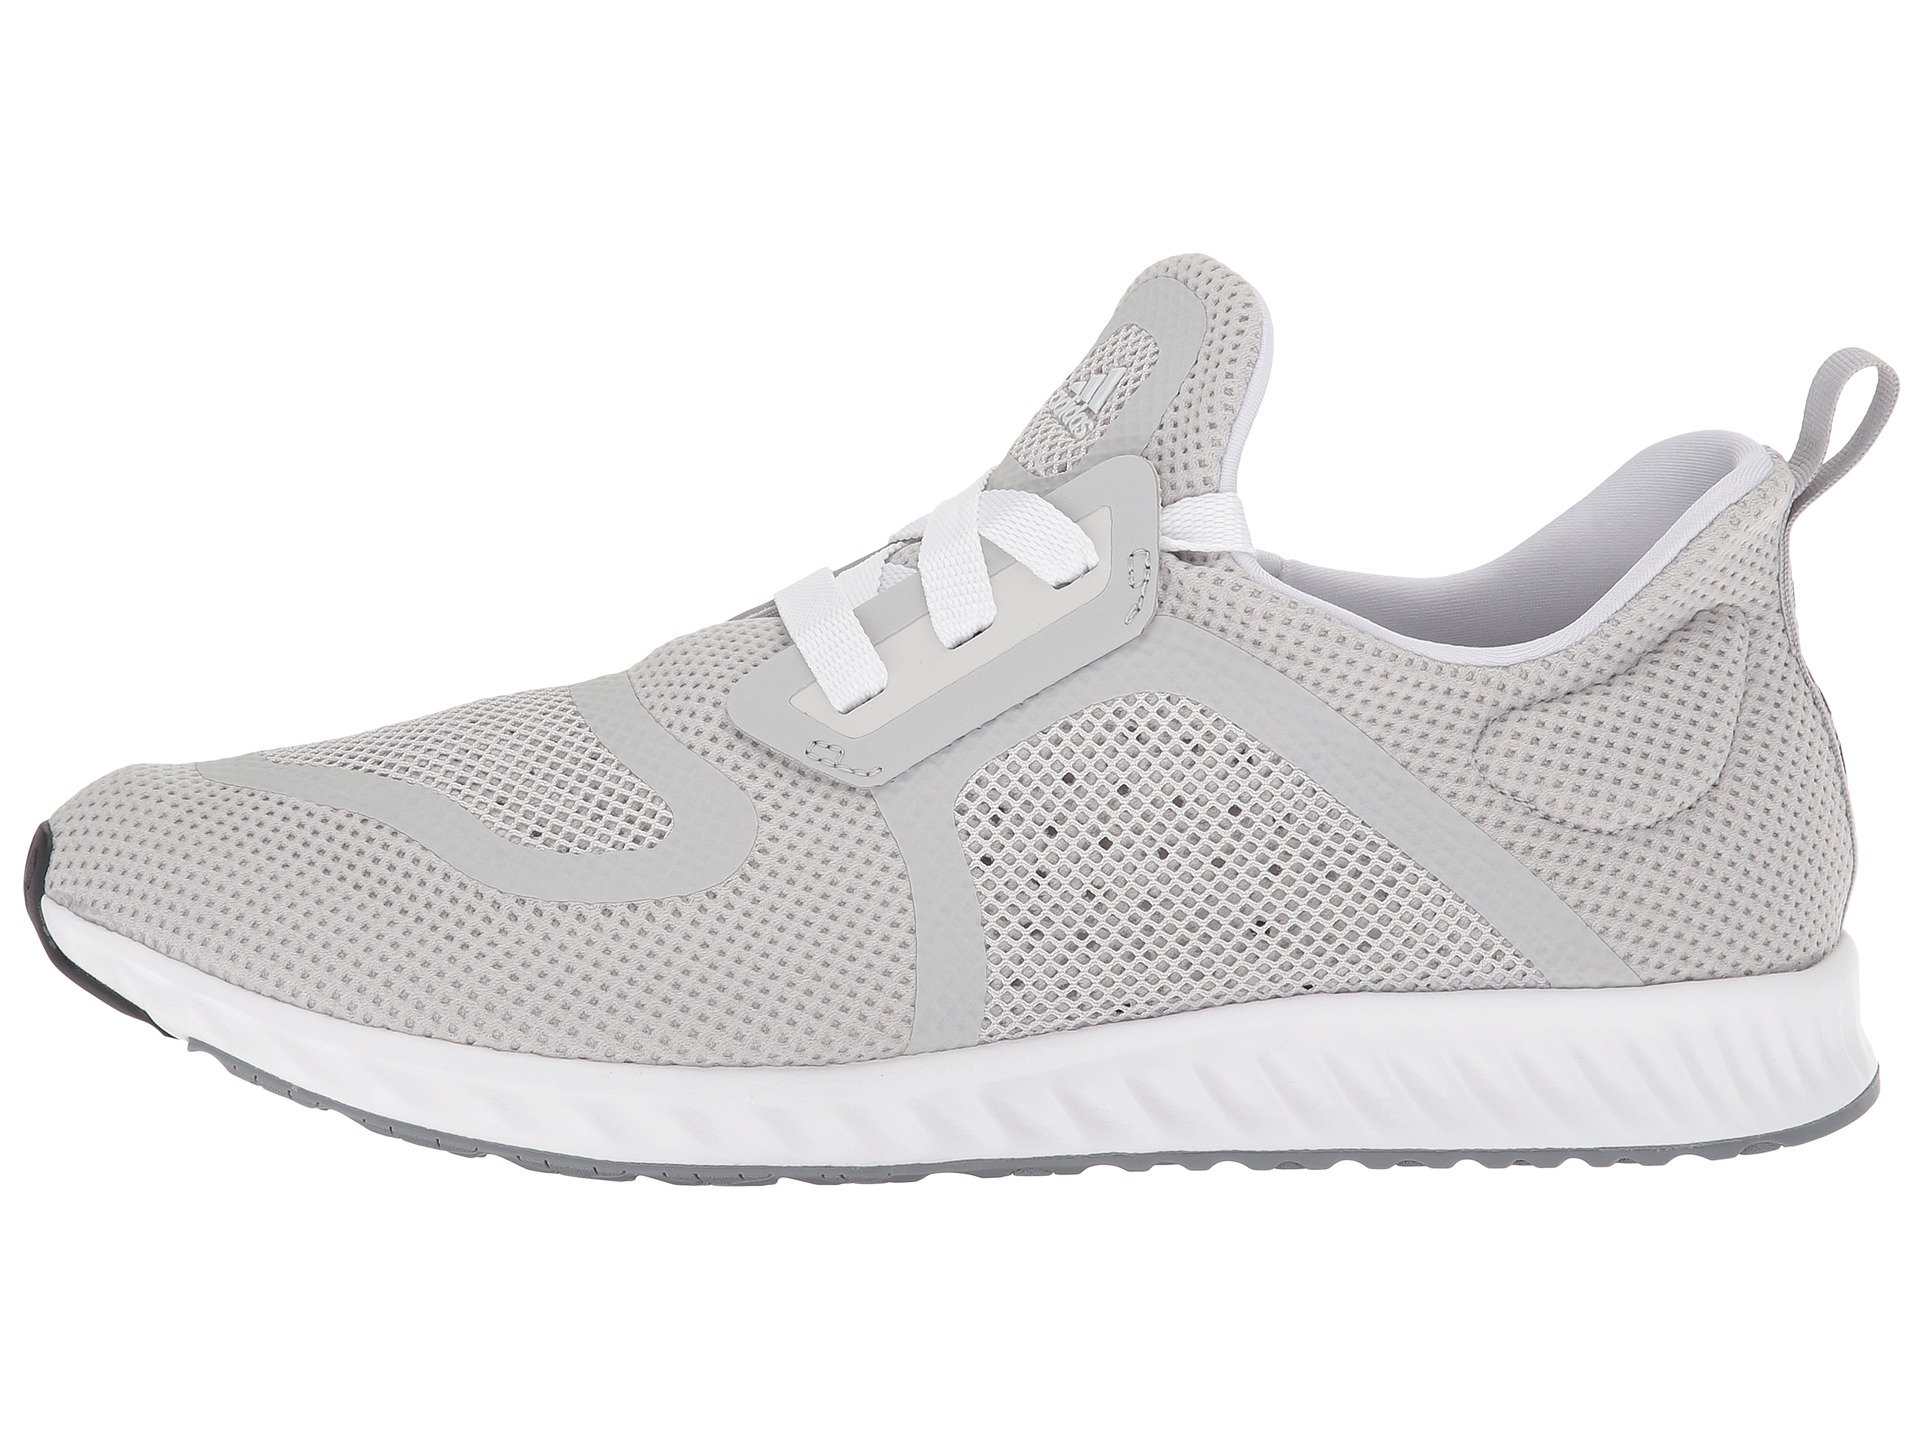 60a9a8cb2c483 Adidas Aq0863 Shoes Black